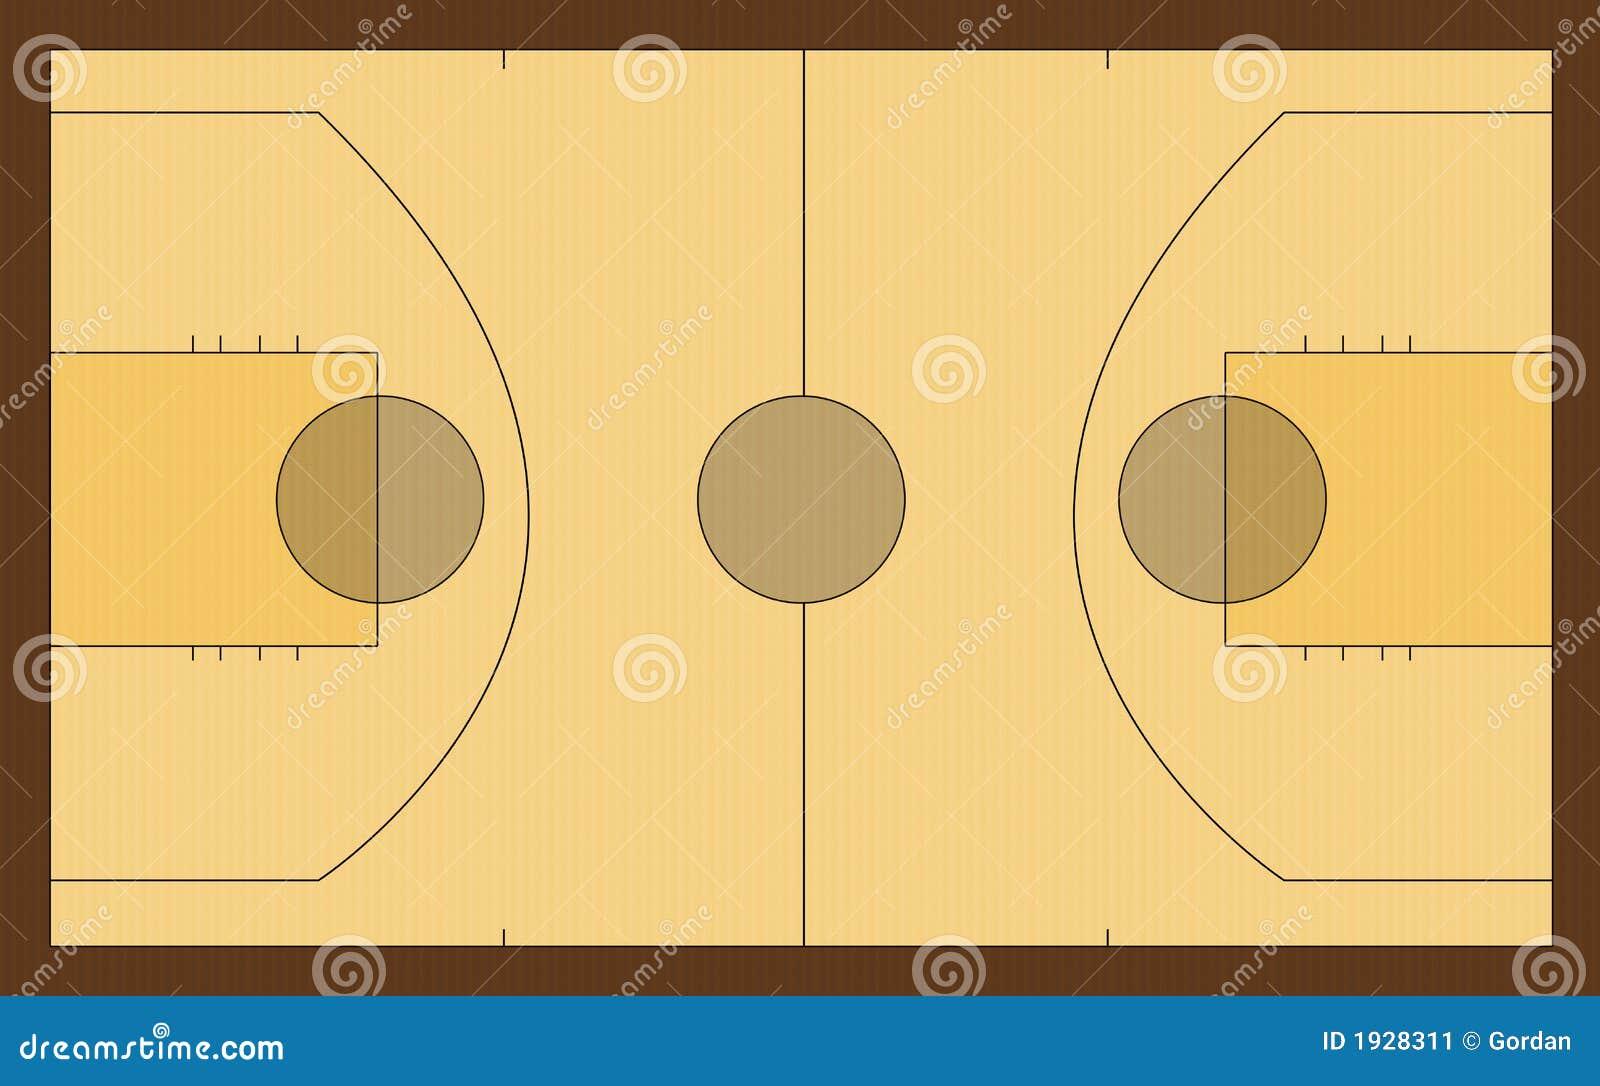 last tweets about image terrain de basket. Black Bedroom Furniture Sets. Home Design Ideas